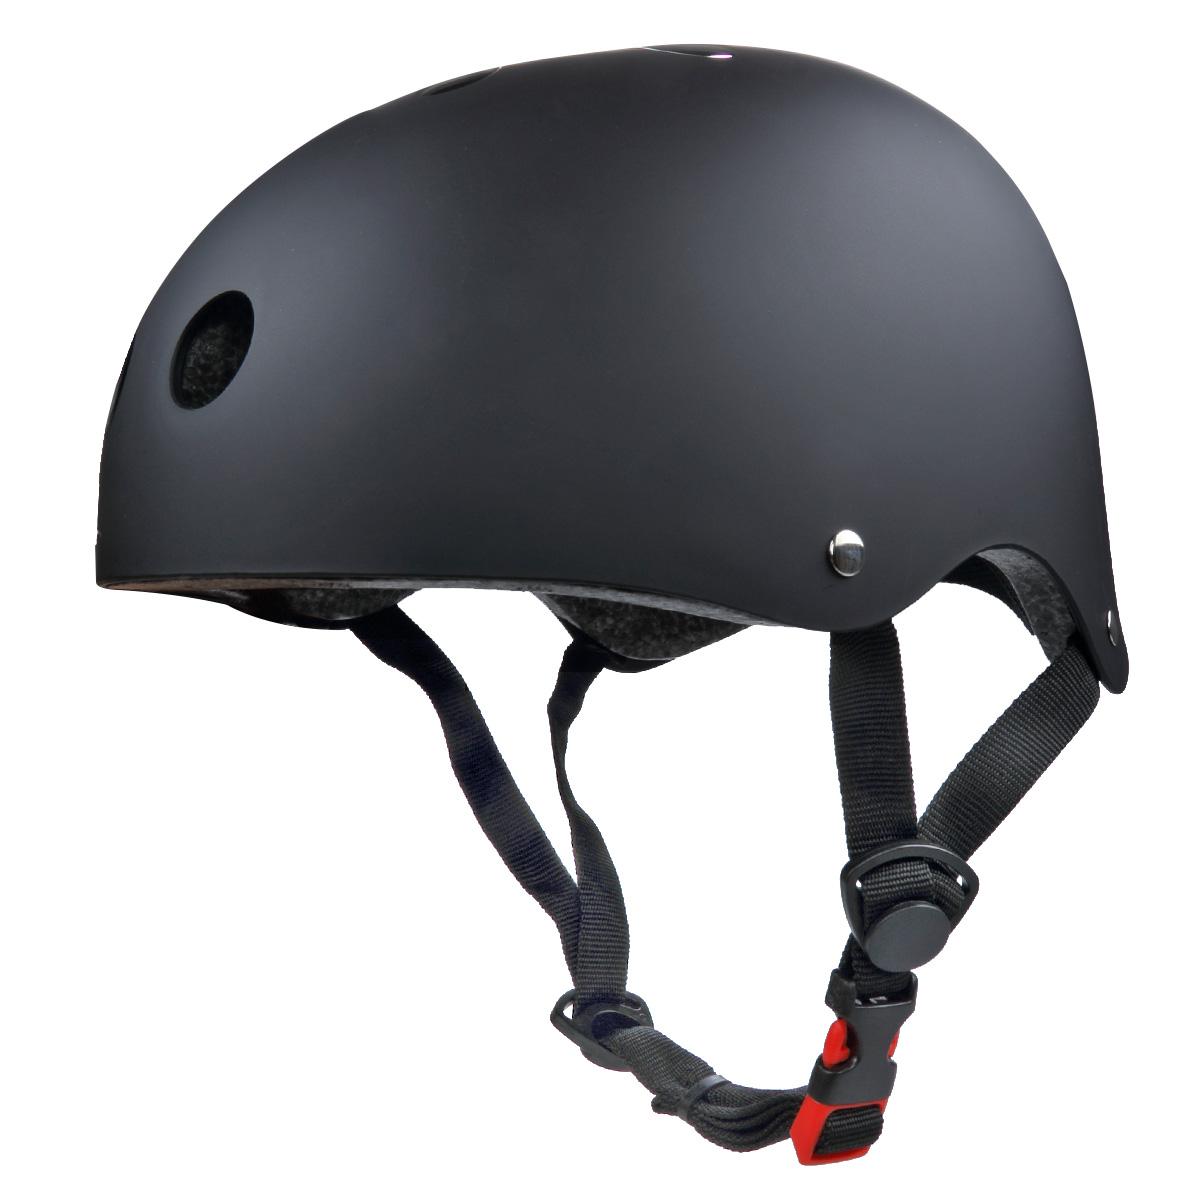 CoastaCloud BMX  Skate   Scooter Skiing Helmet Ultimate Cycle Bike Skating Helmet for Kids  Adults Professional Hip-hop... by CoastaCloud